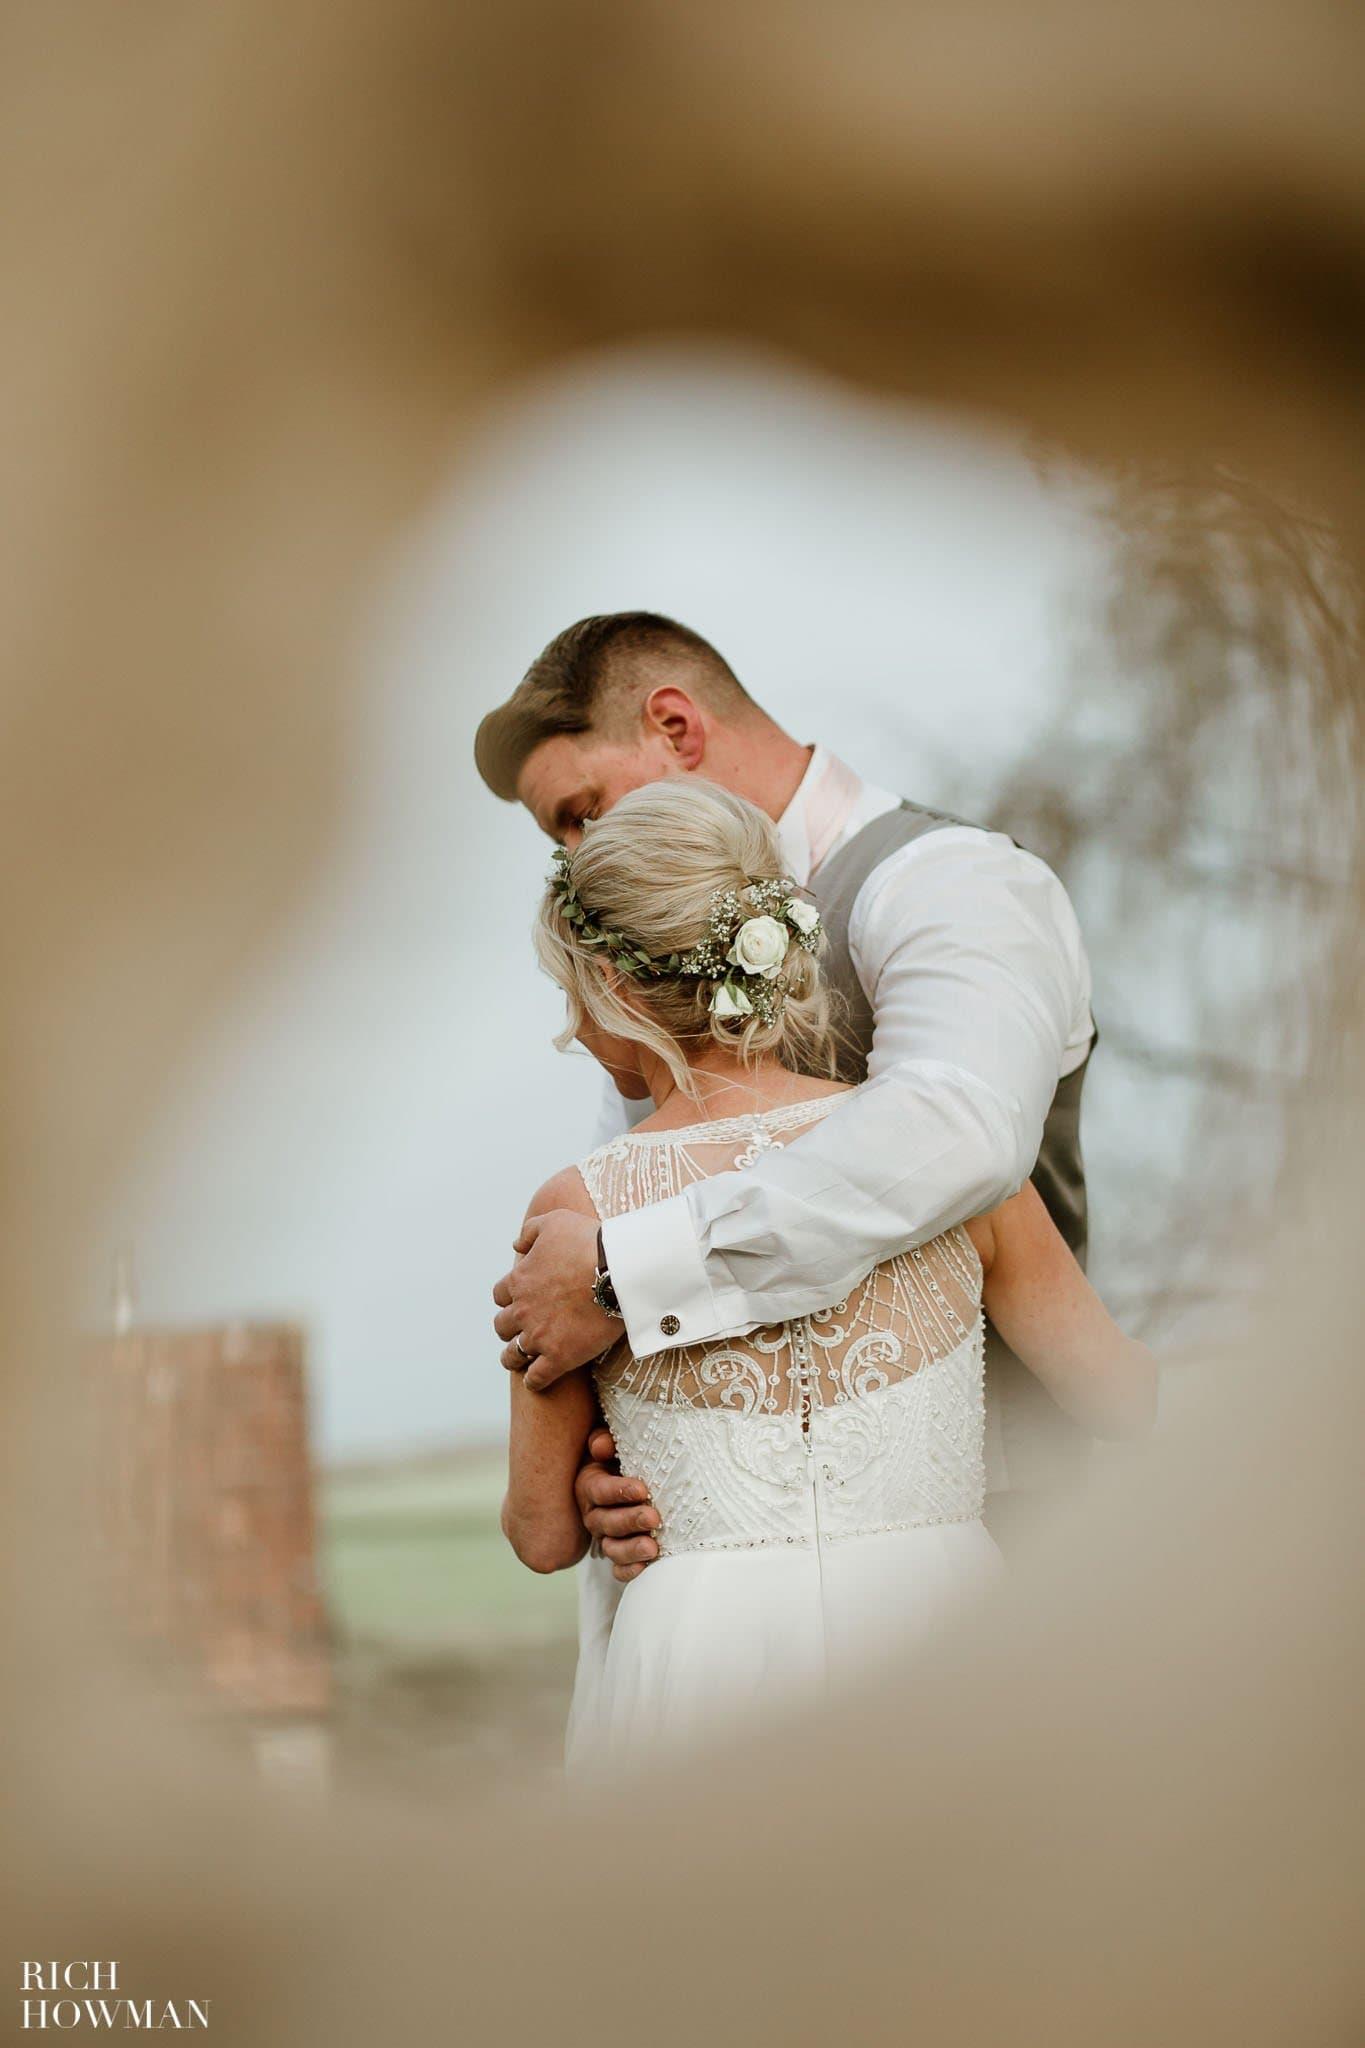 Kingscote Barn Wedding Photographer in Gloucestershire 598